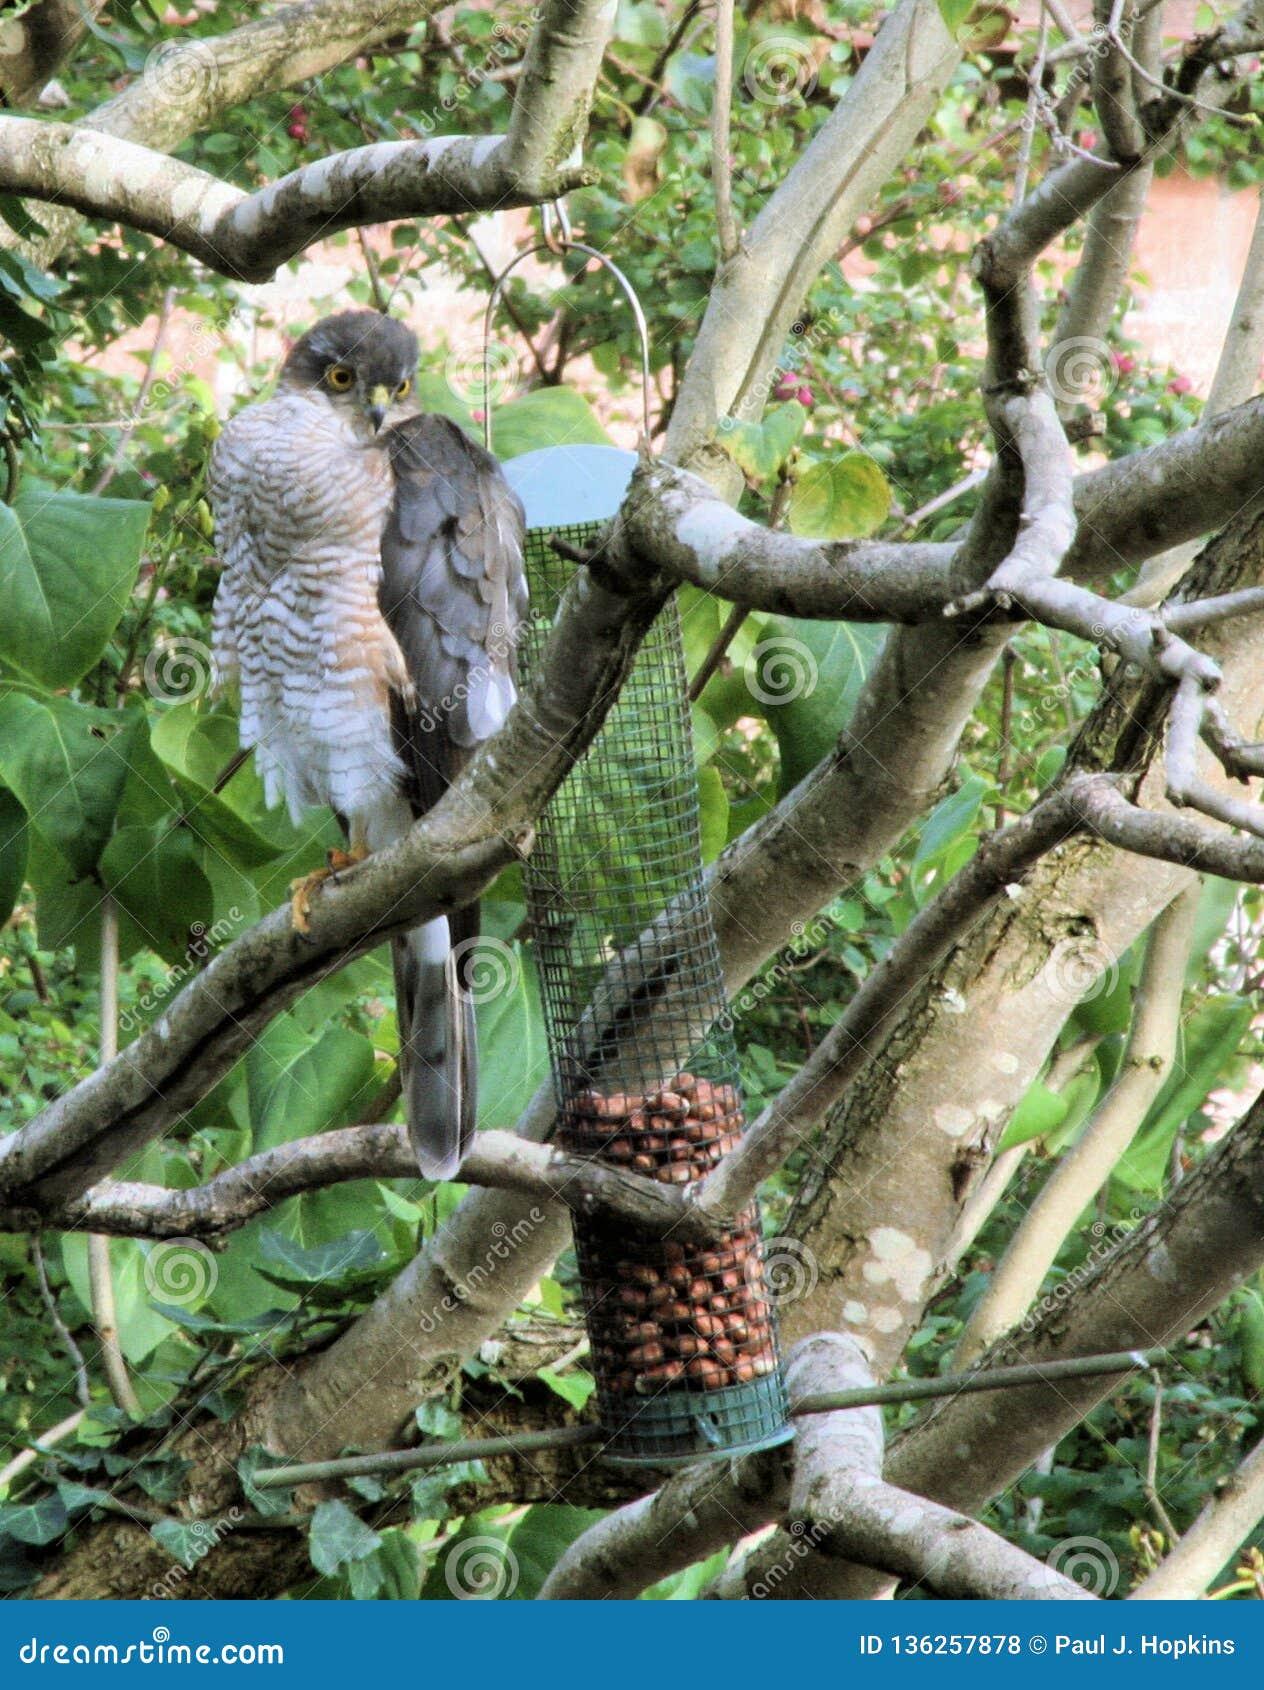 Sparrowhawk at Bird Feeders